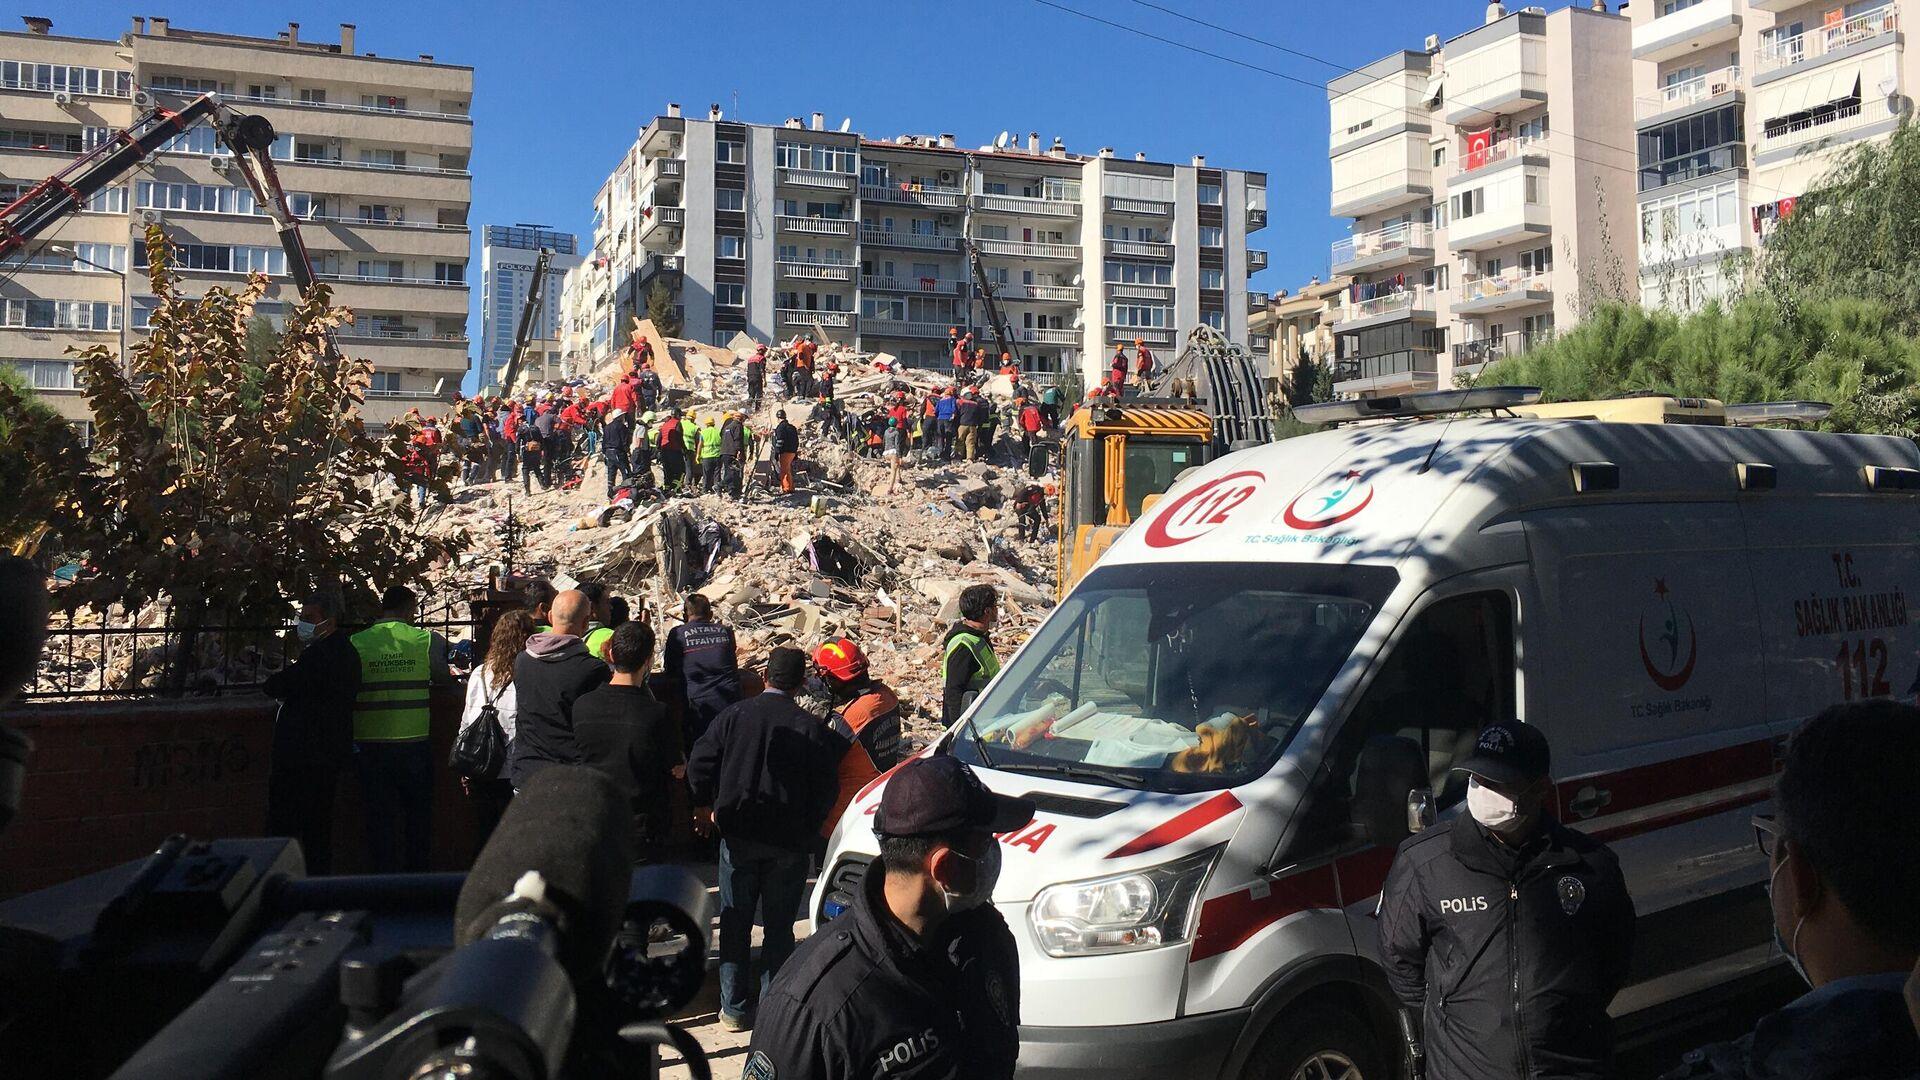 Ликвидация последствий землетрясения в Измире, Турция - РИА Новости, 1920, 31.10.2020